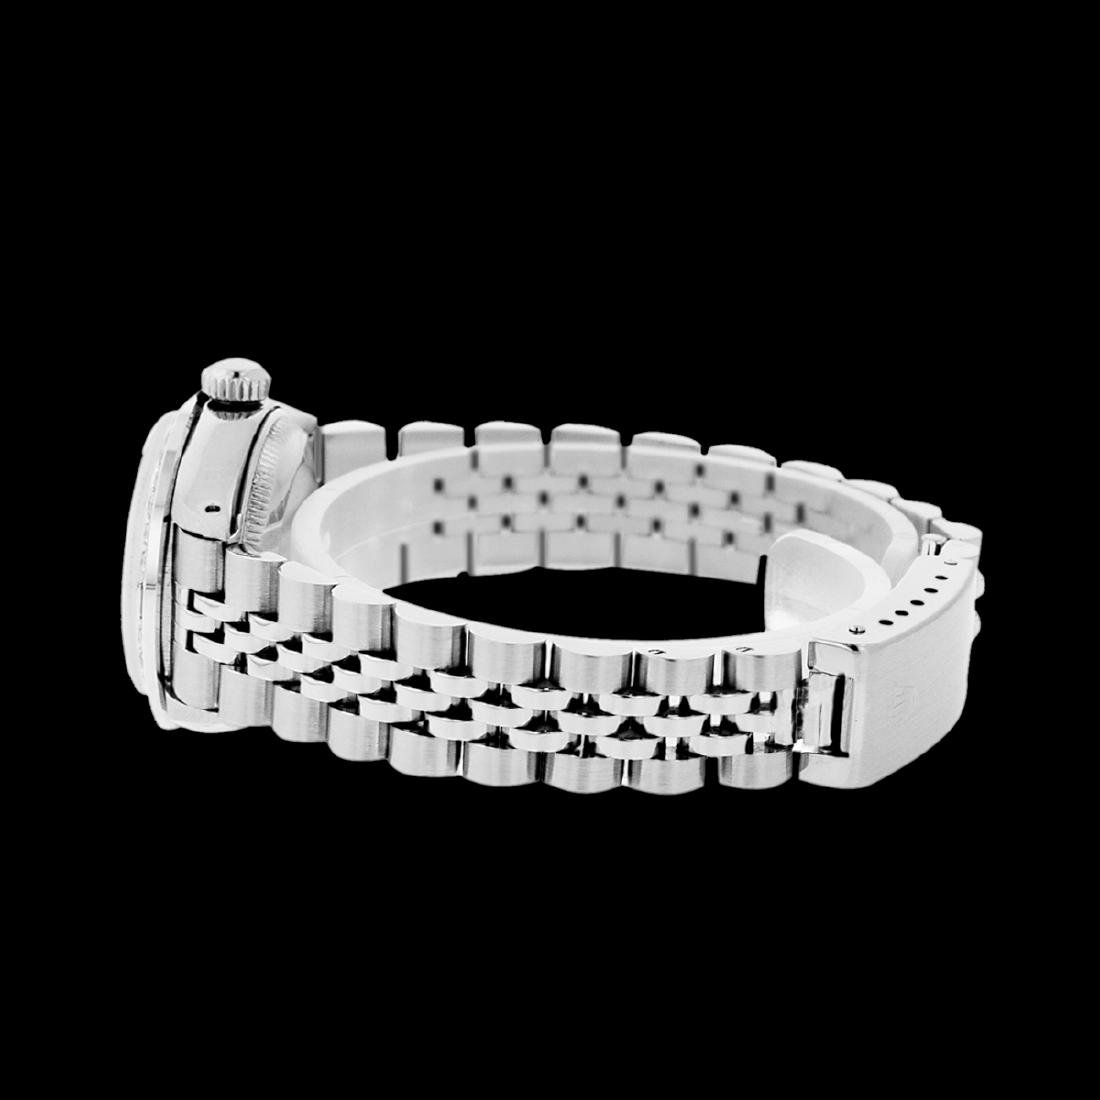 Rolex Men's Stainless Steel, QuickSet, Diam/Emerald - 3